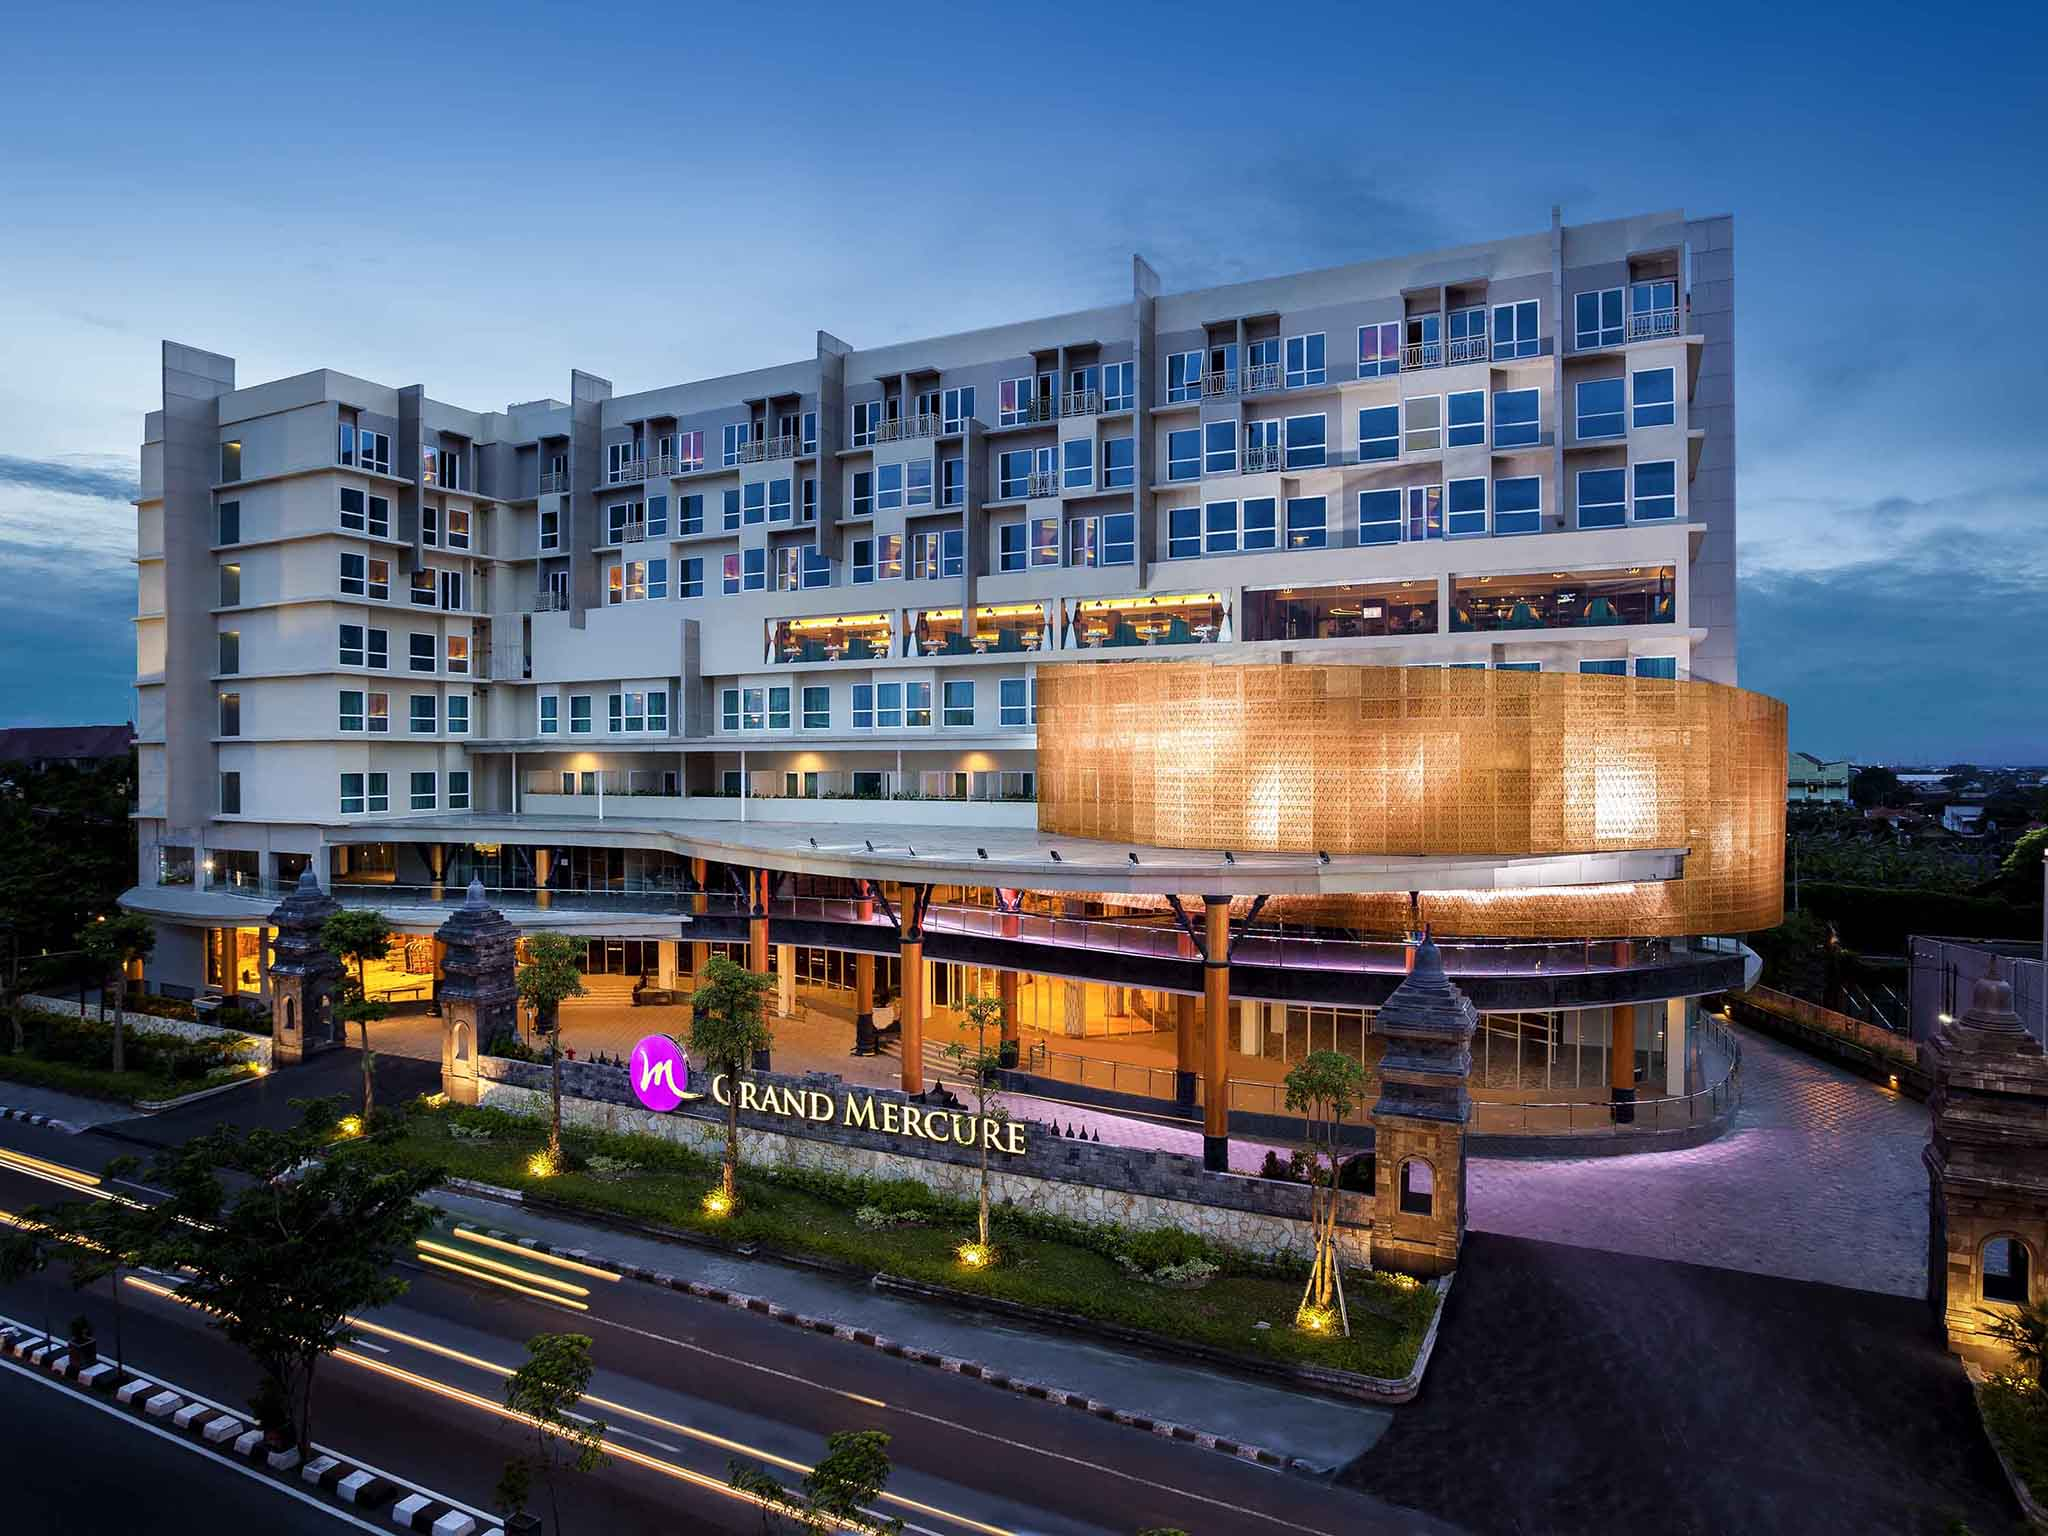 New 5 Star Hotel